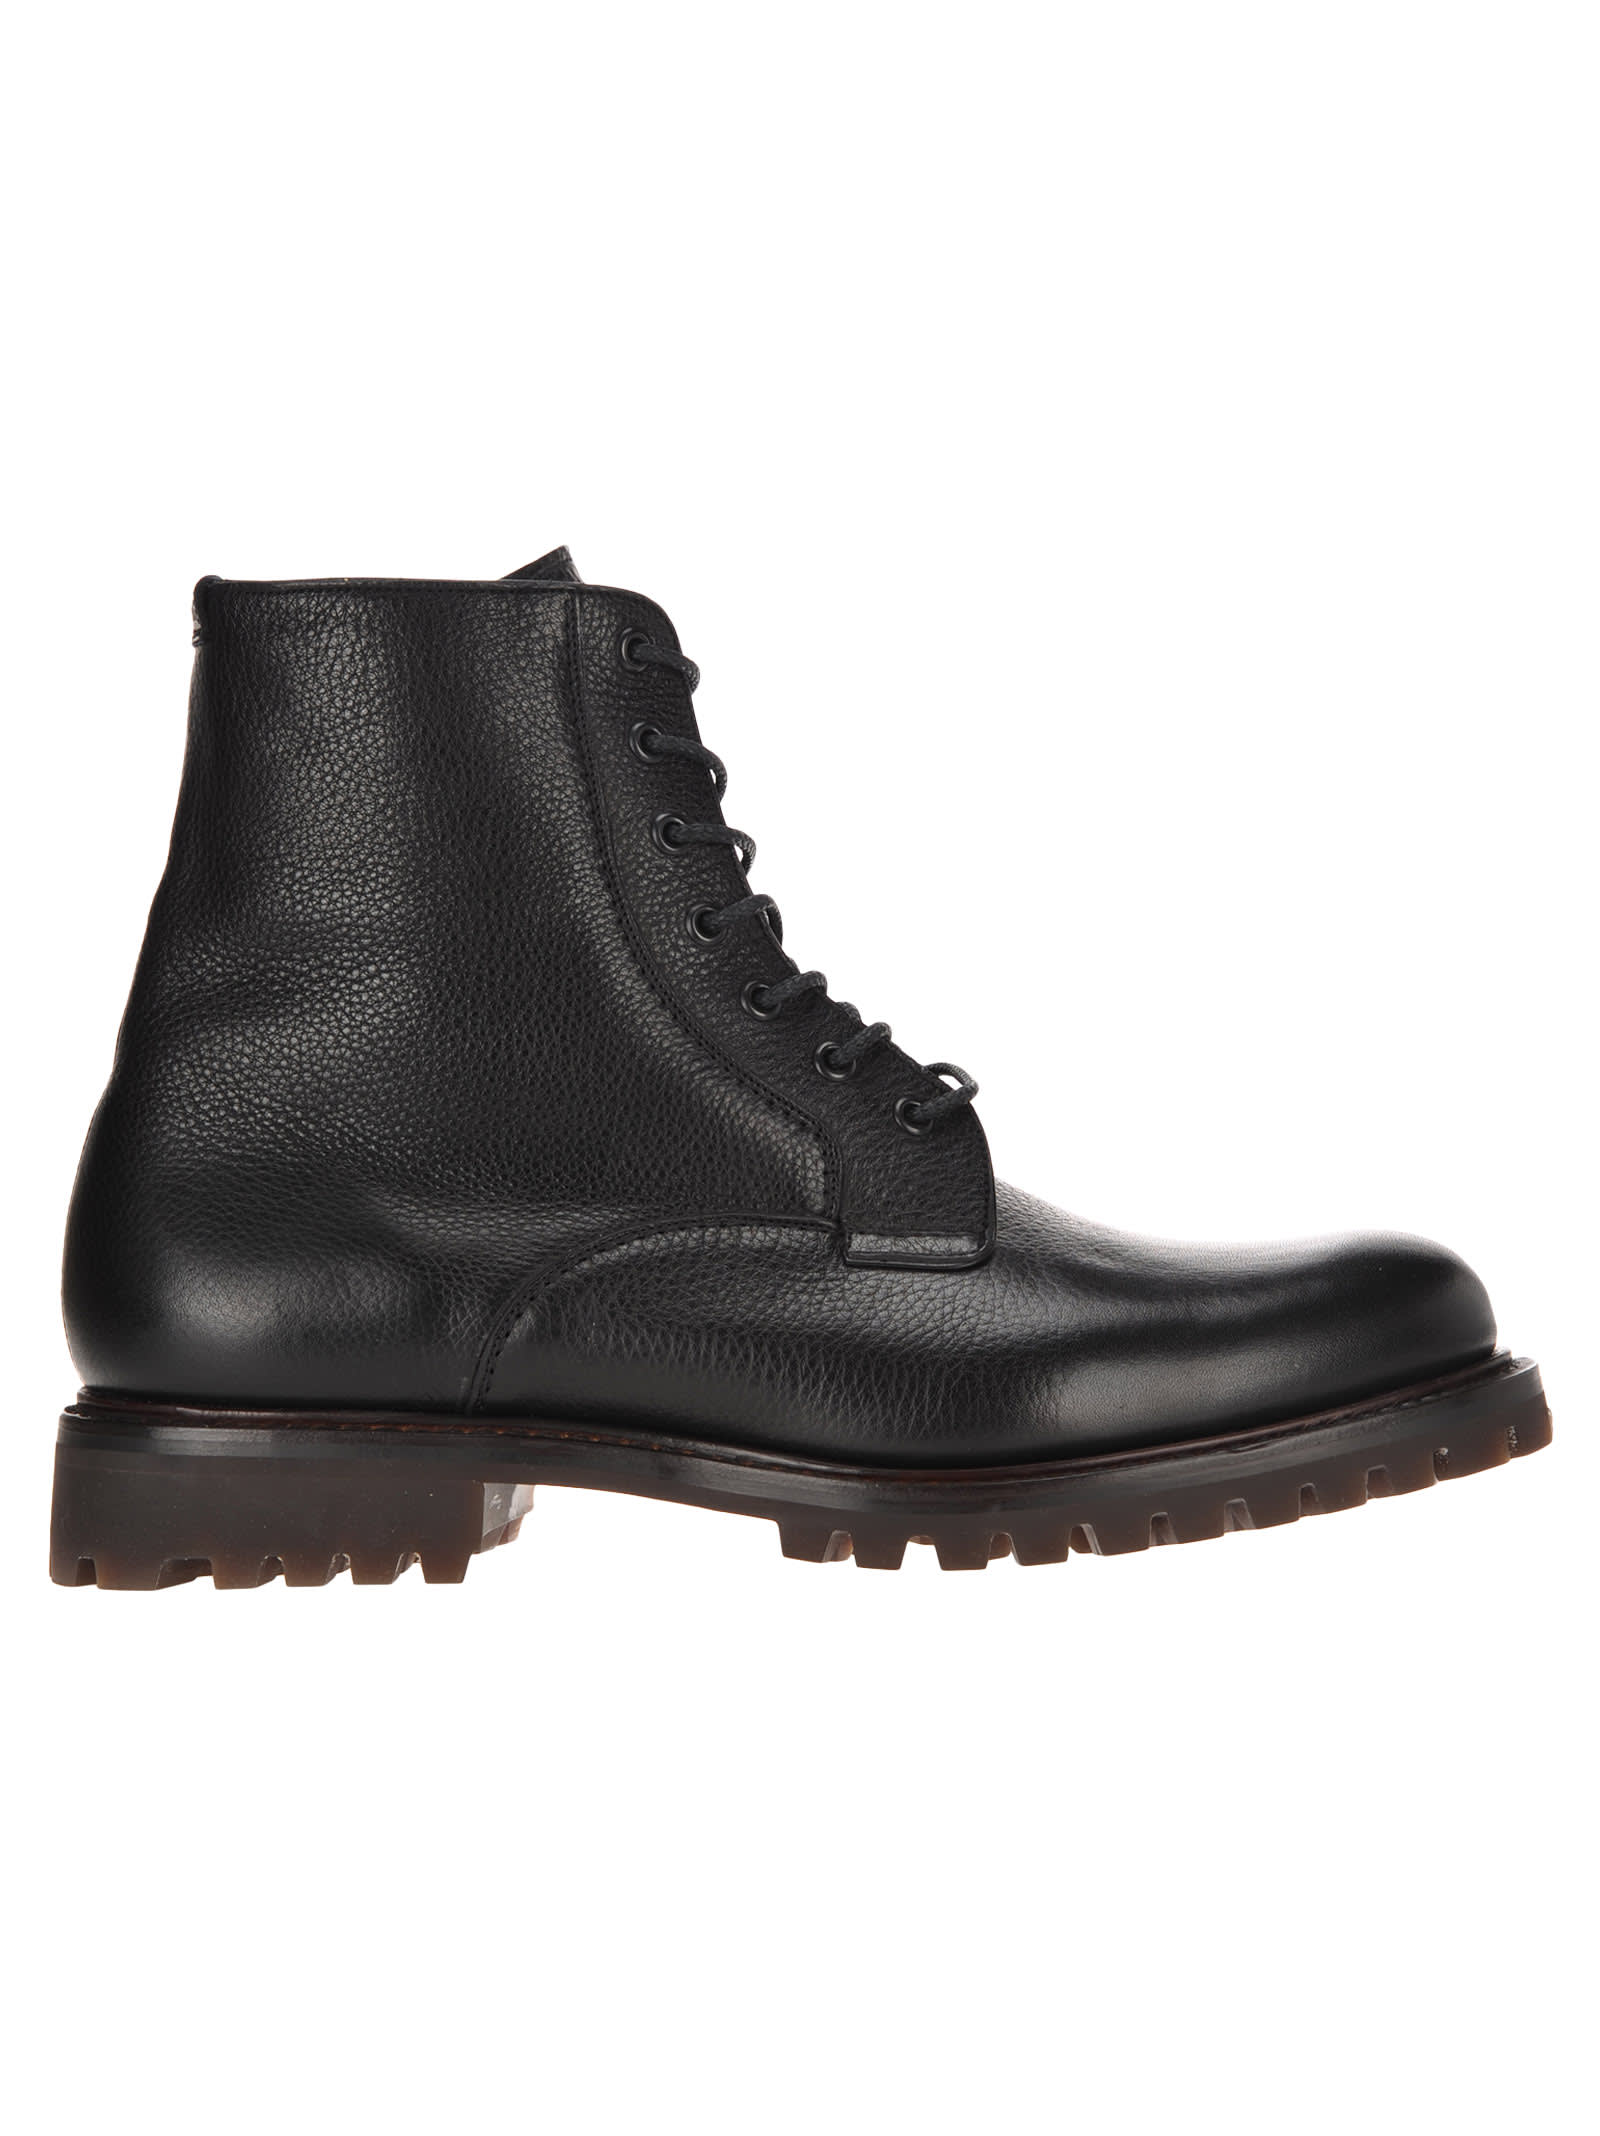 Churchs Coalport Boots